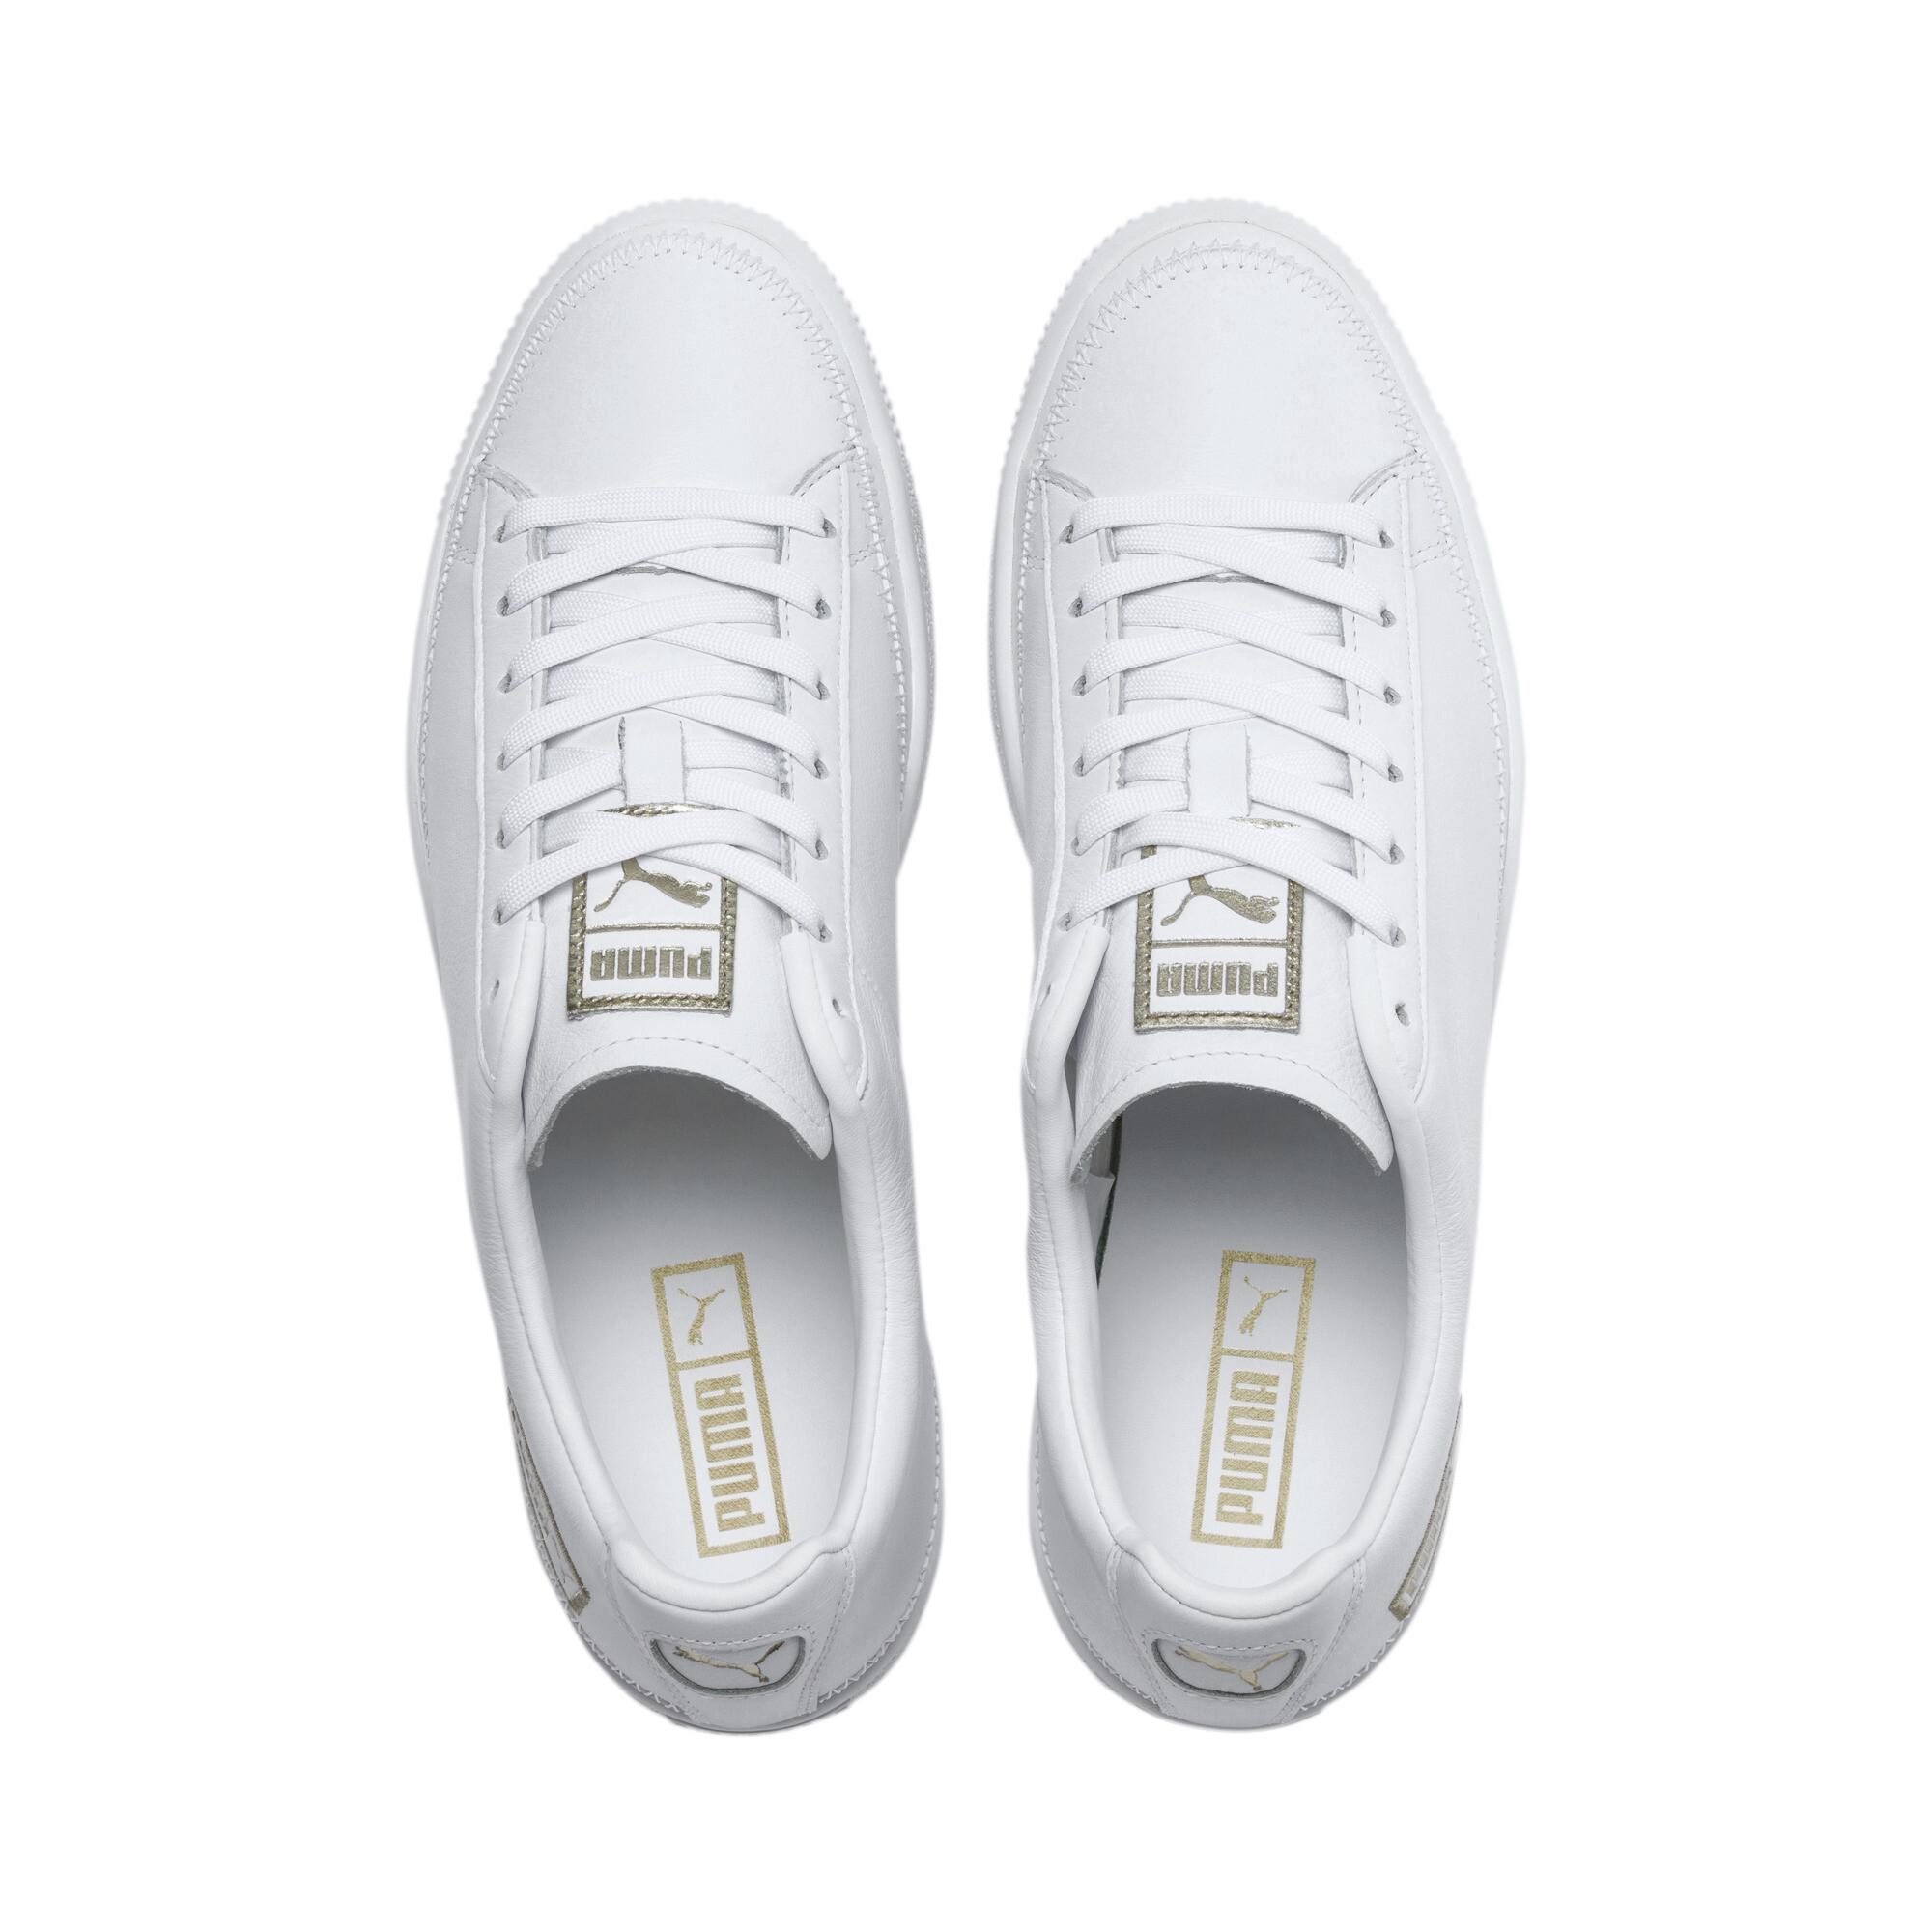 PUMA-Basket-Stitch-Sneaker-Unisex-Schuhe-Neu Indexbild 7